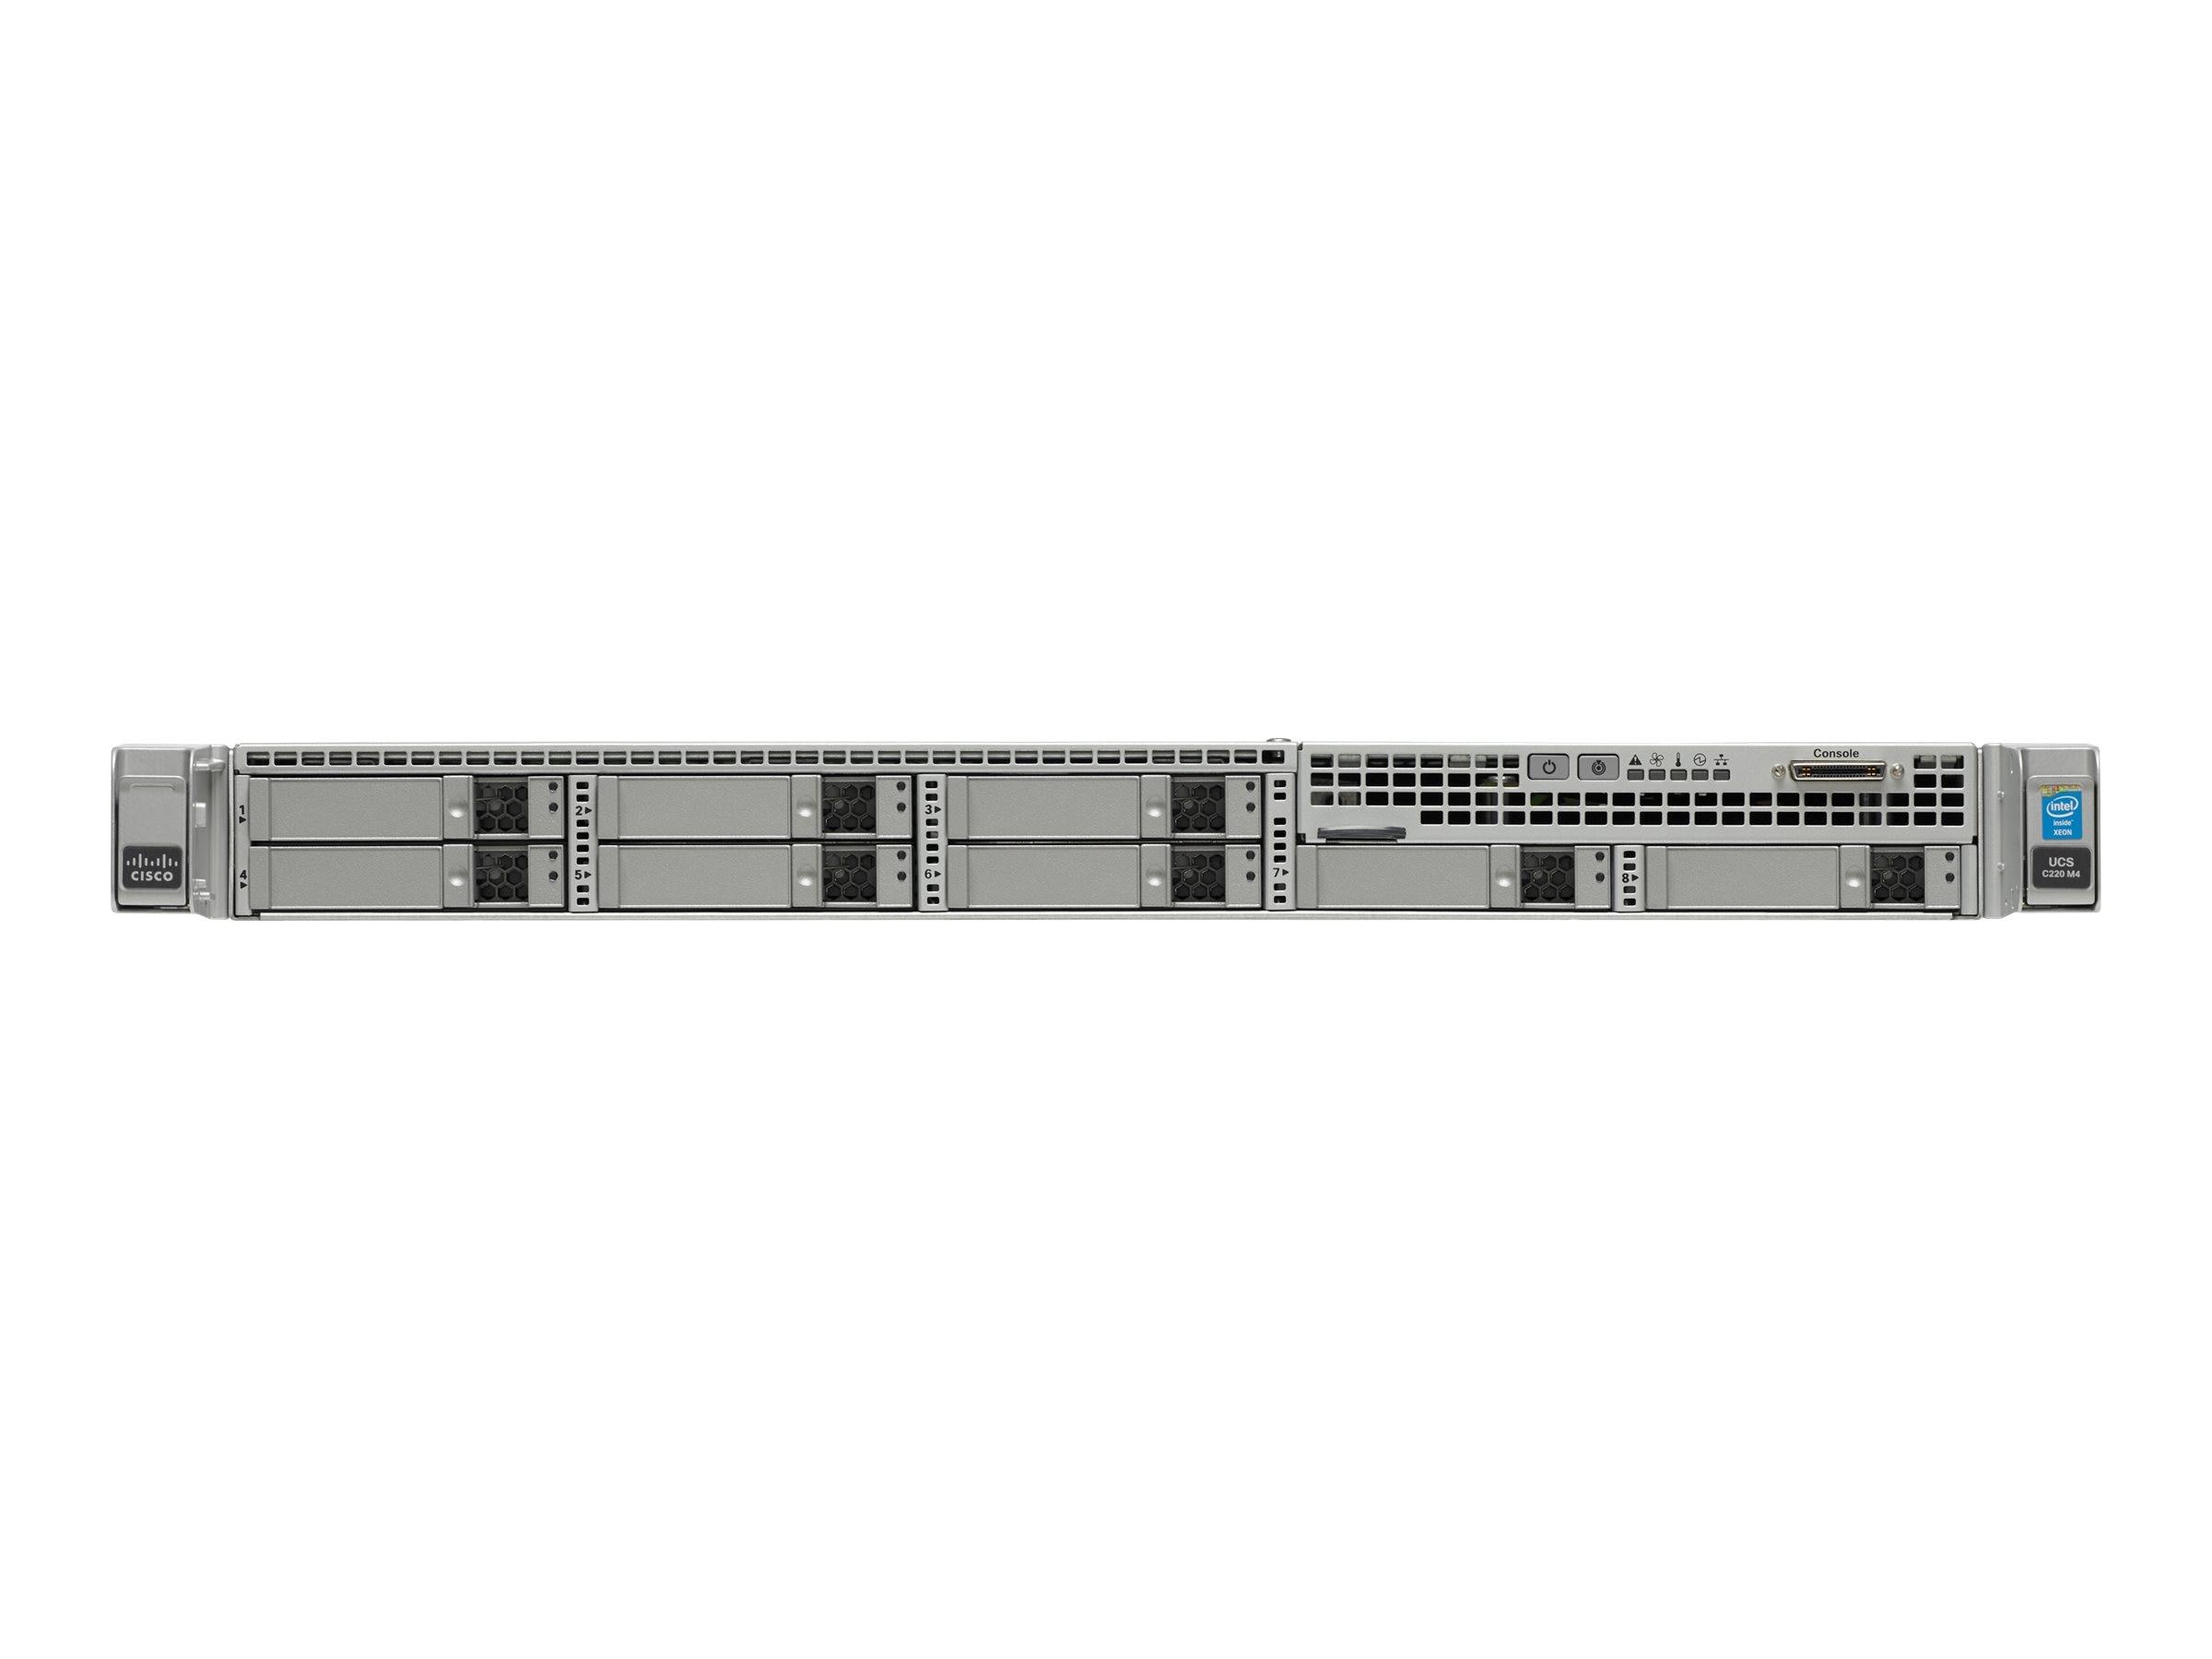 Cisco PI-UCS-APL-K9 Image 2